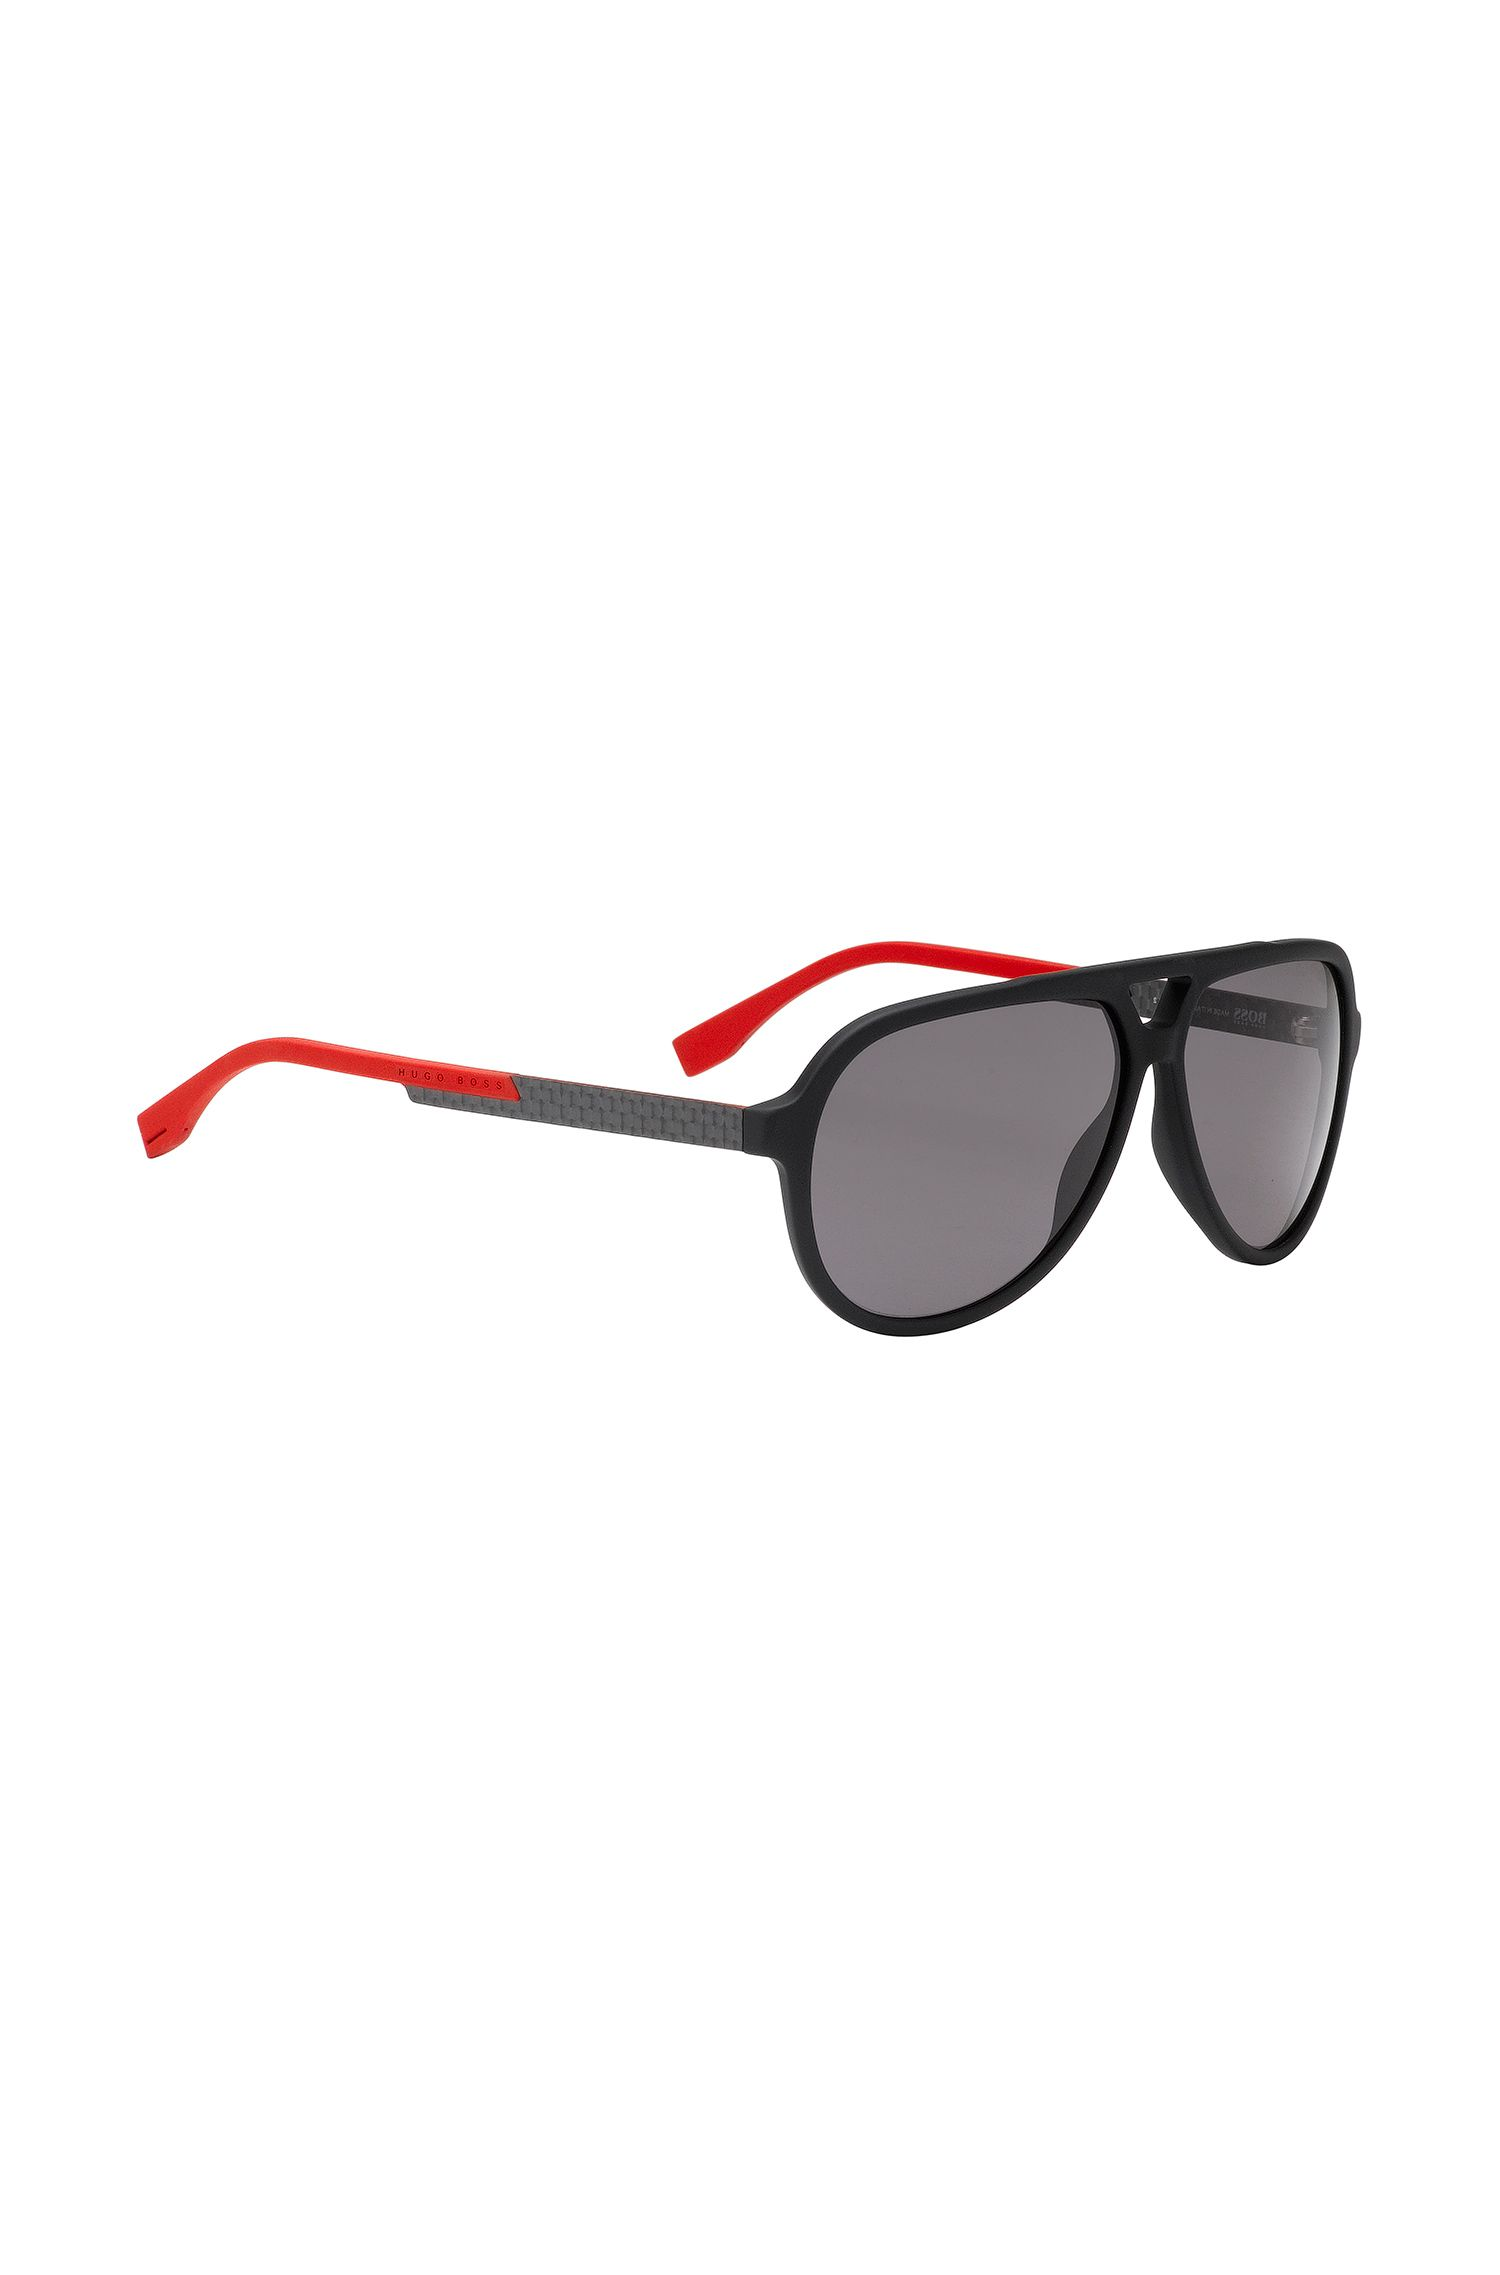 Sunglasses: 'BOSS 0731/S'